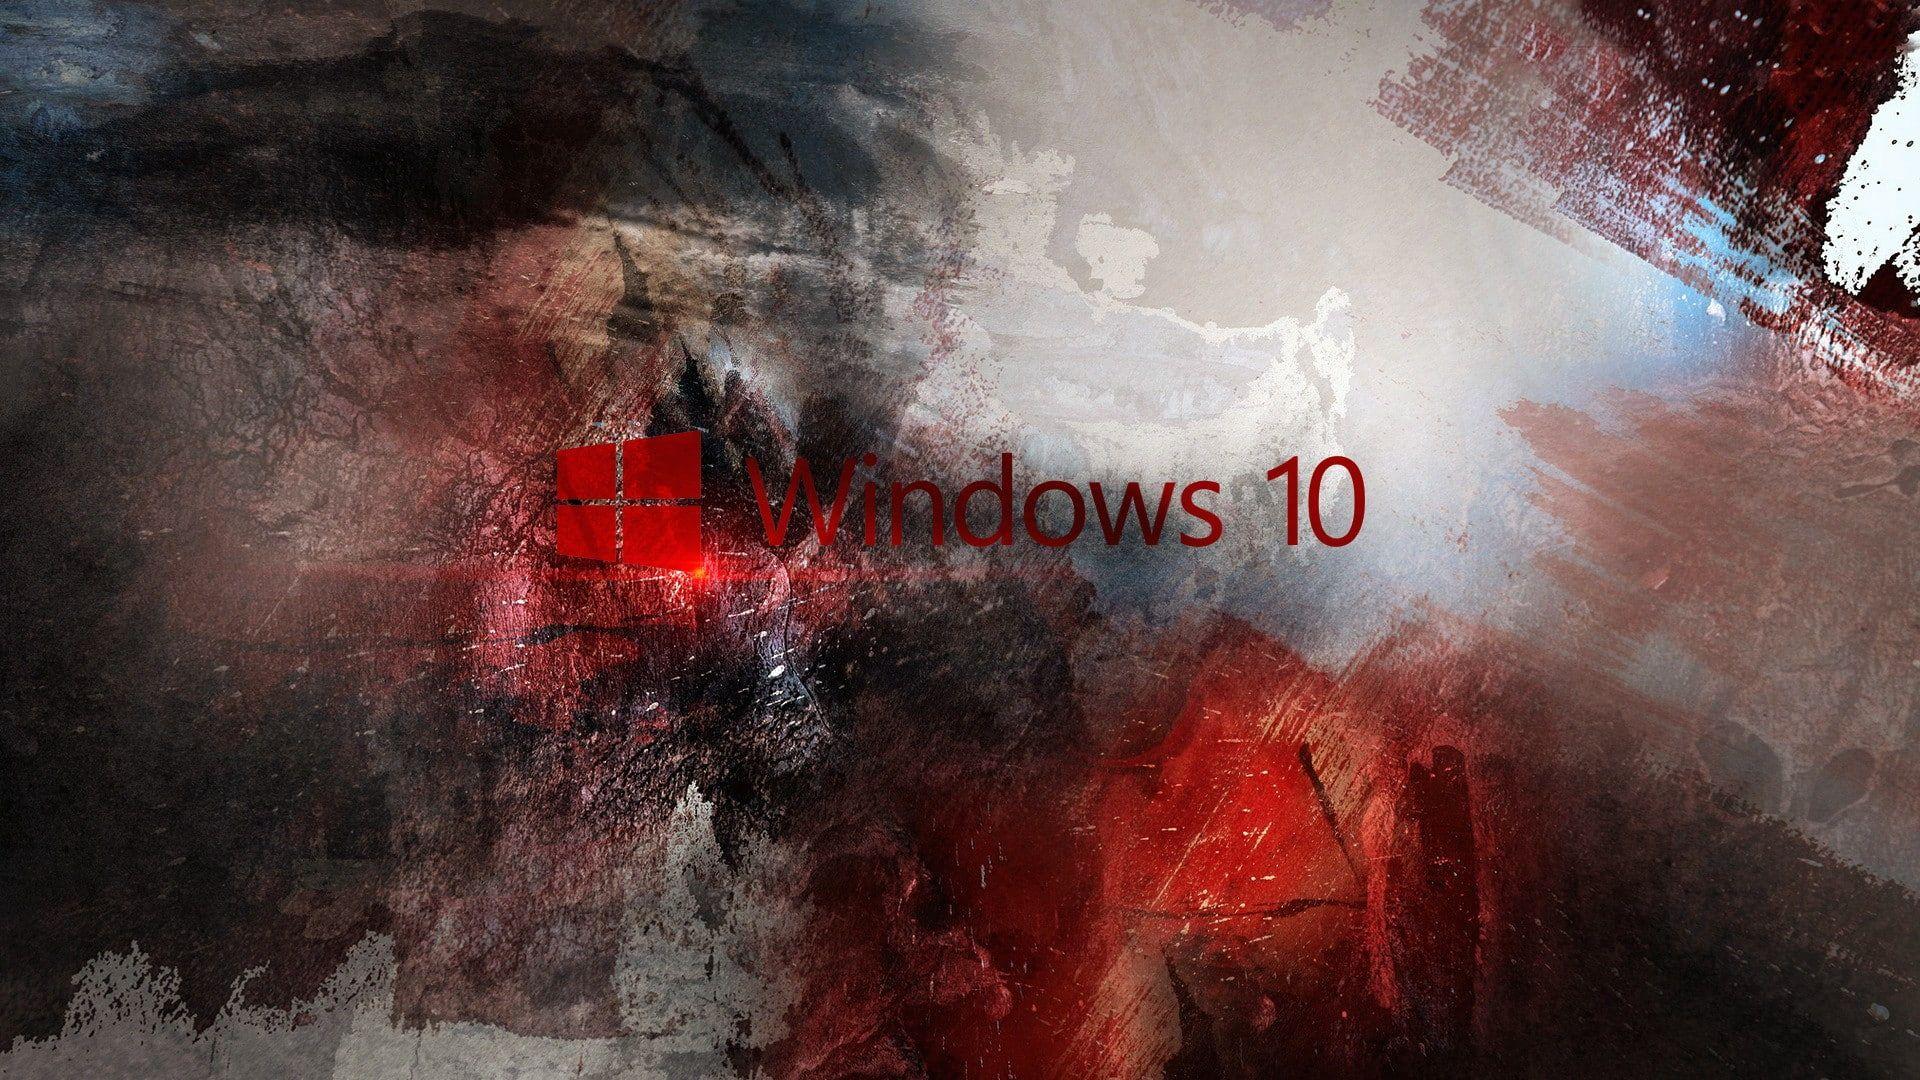 Microsoft Windows 10 Logo Windows 10 Logo Red Logo Computer Operating System Microsoft Windose H In 2020 Windows 10 Wallpaper Windows 10 Background Hd Wallpaper